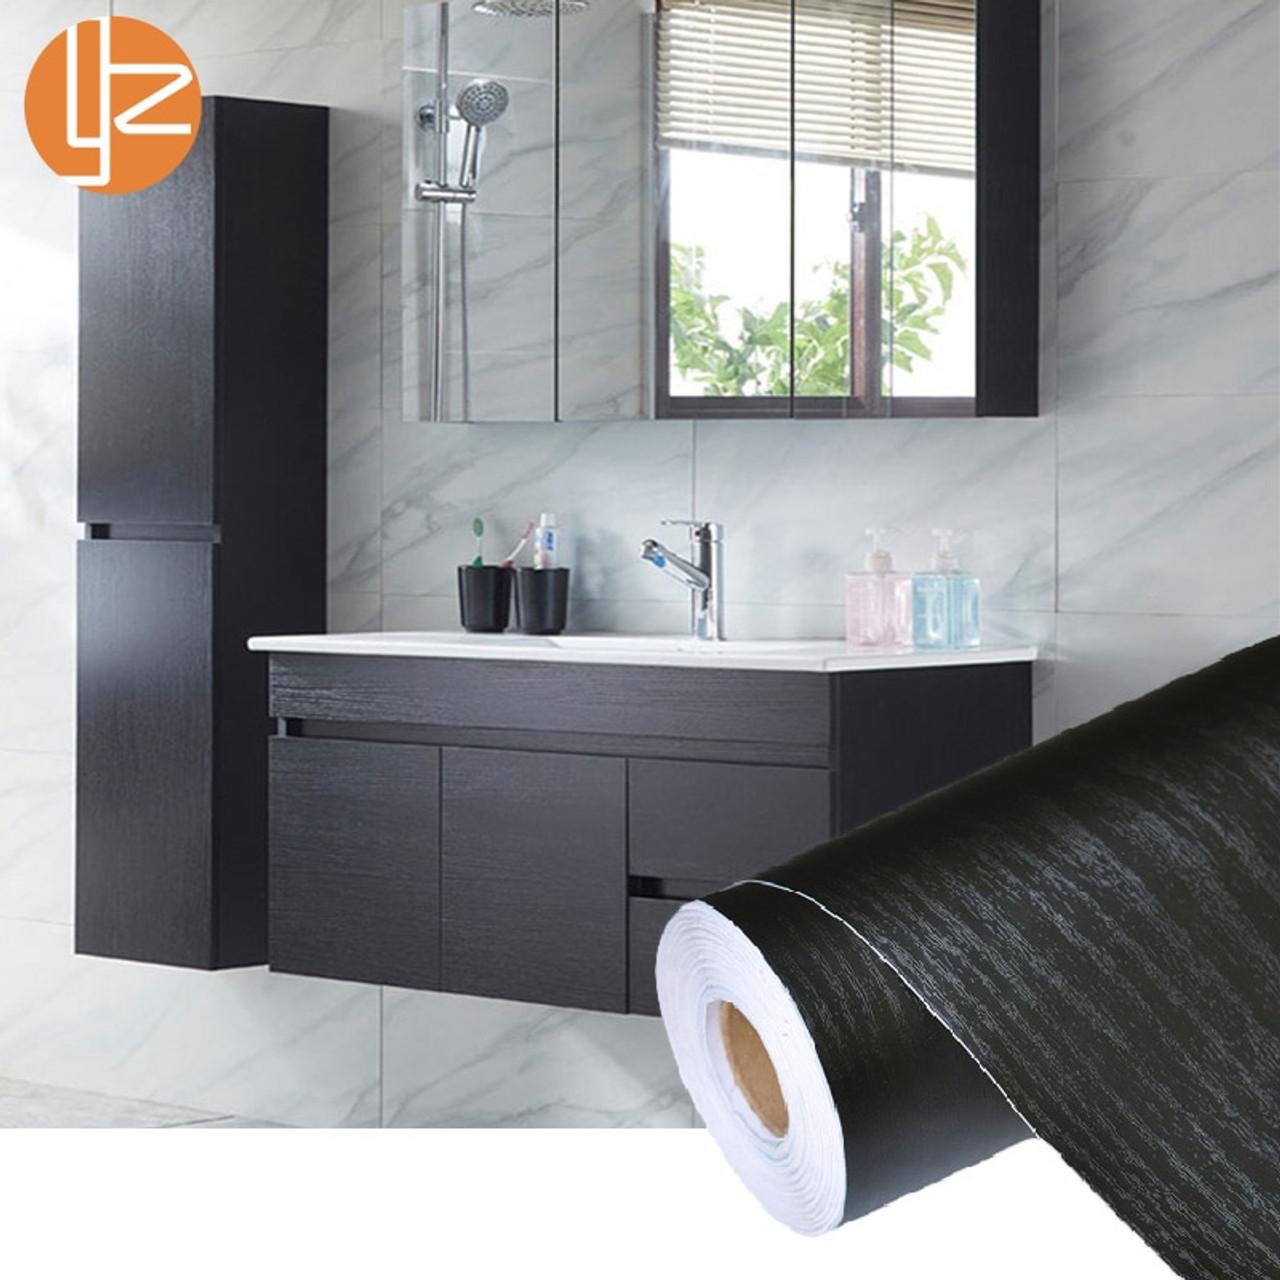 Vinyl Black Wood Grain Wallpaper Self Adhesive Wall Paper Furniture Stickers